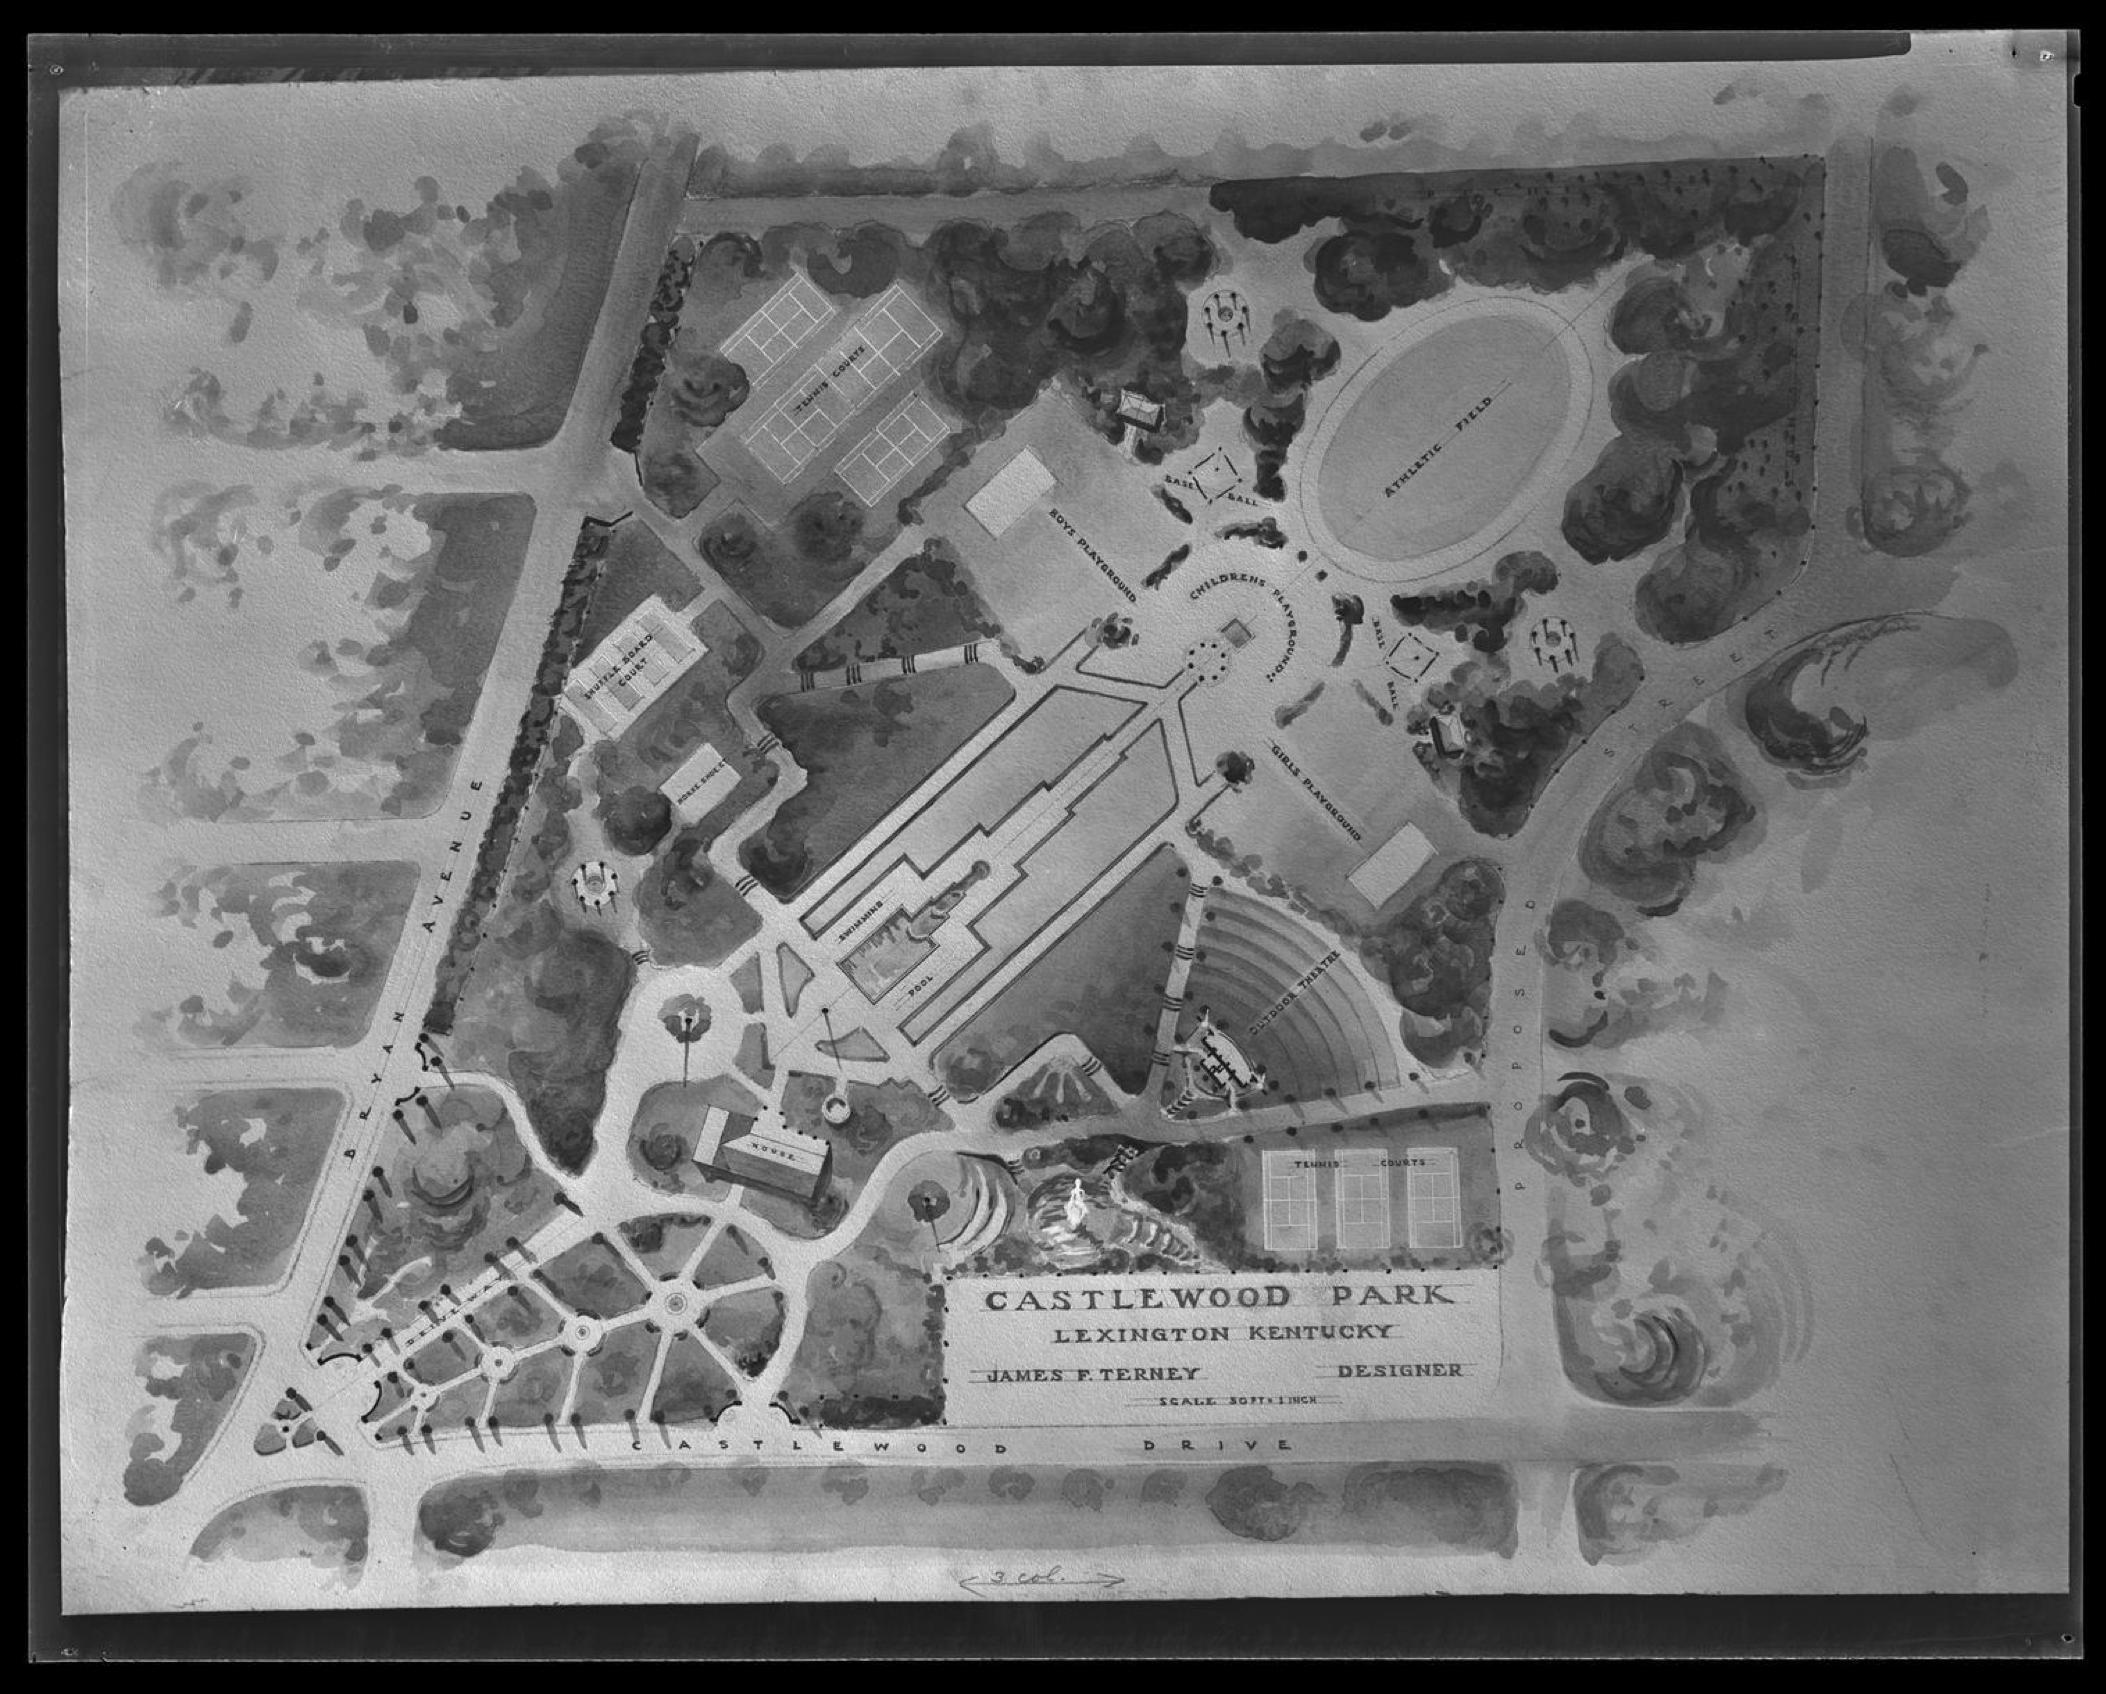 Castlewood Park - Original Design courtesy: Kentucky Digital Library